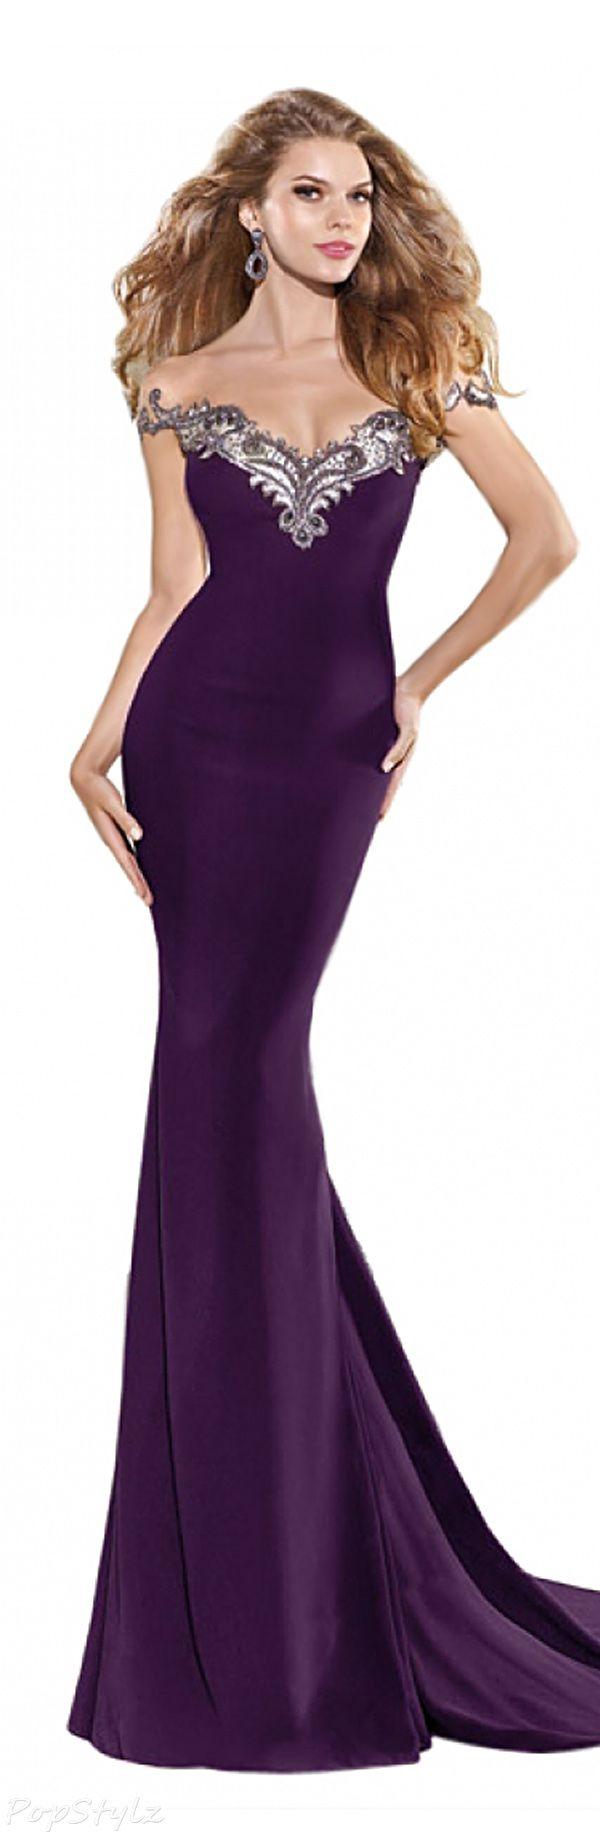 Tarik Ediz Gown- Gorgeous !